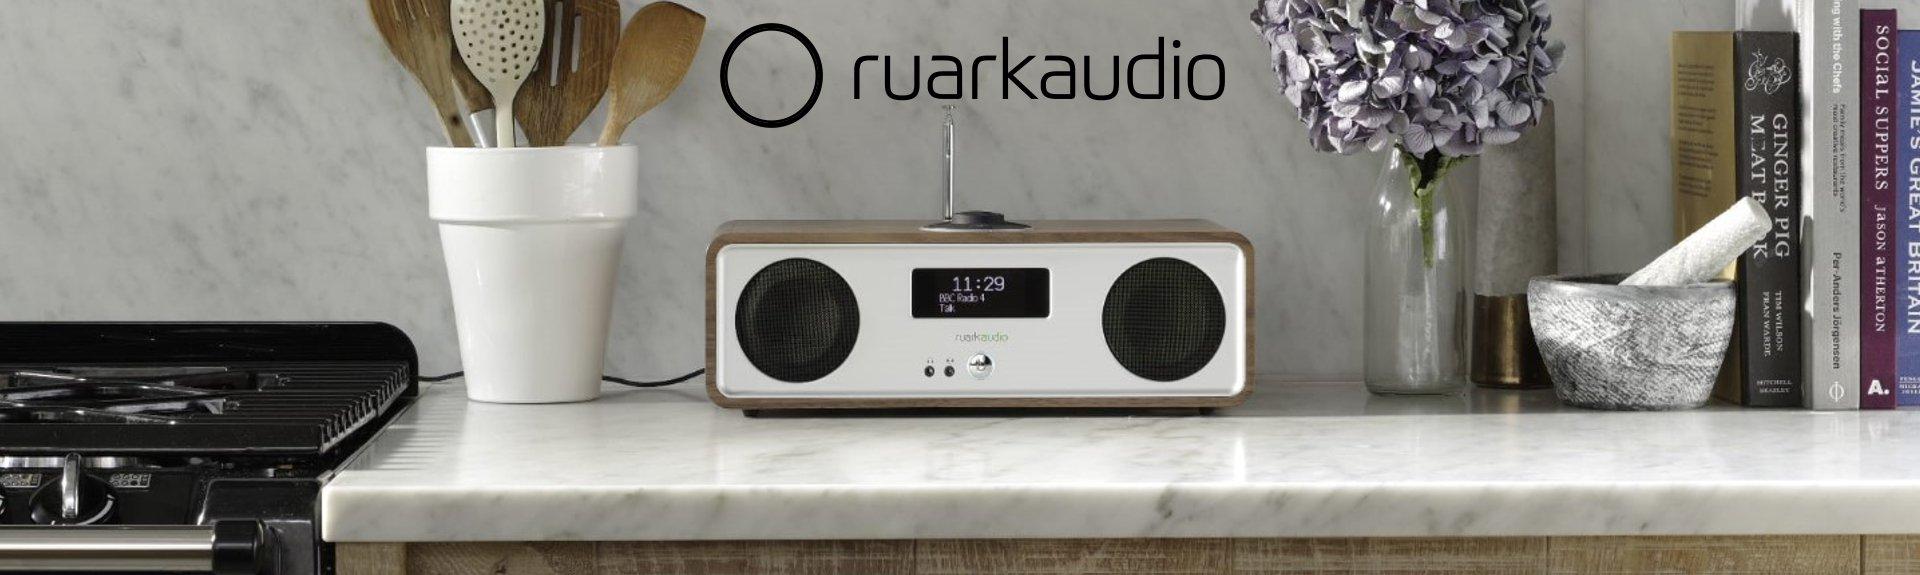 RuarkAudio